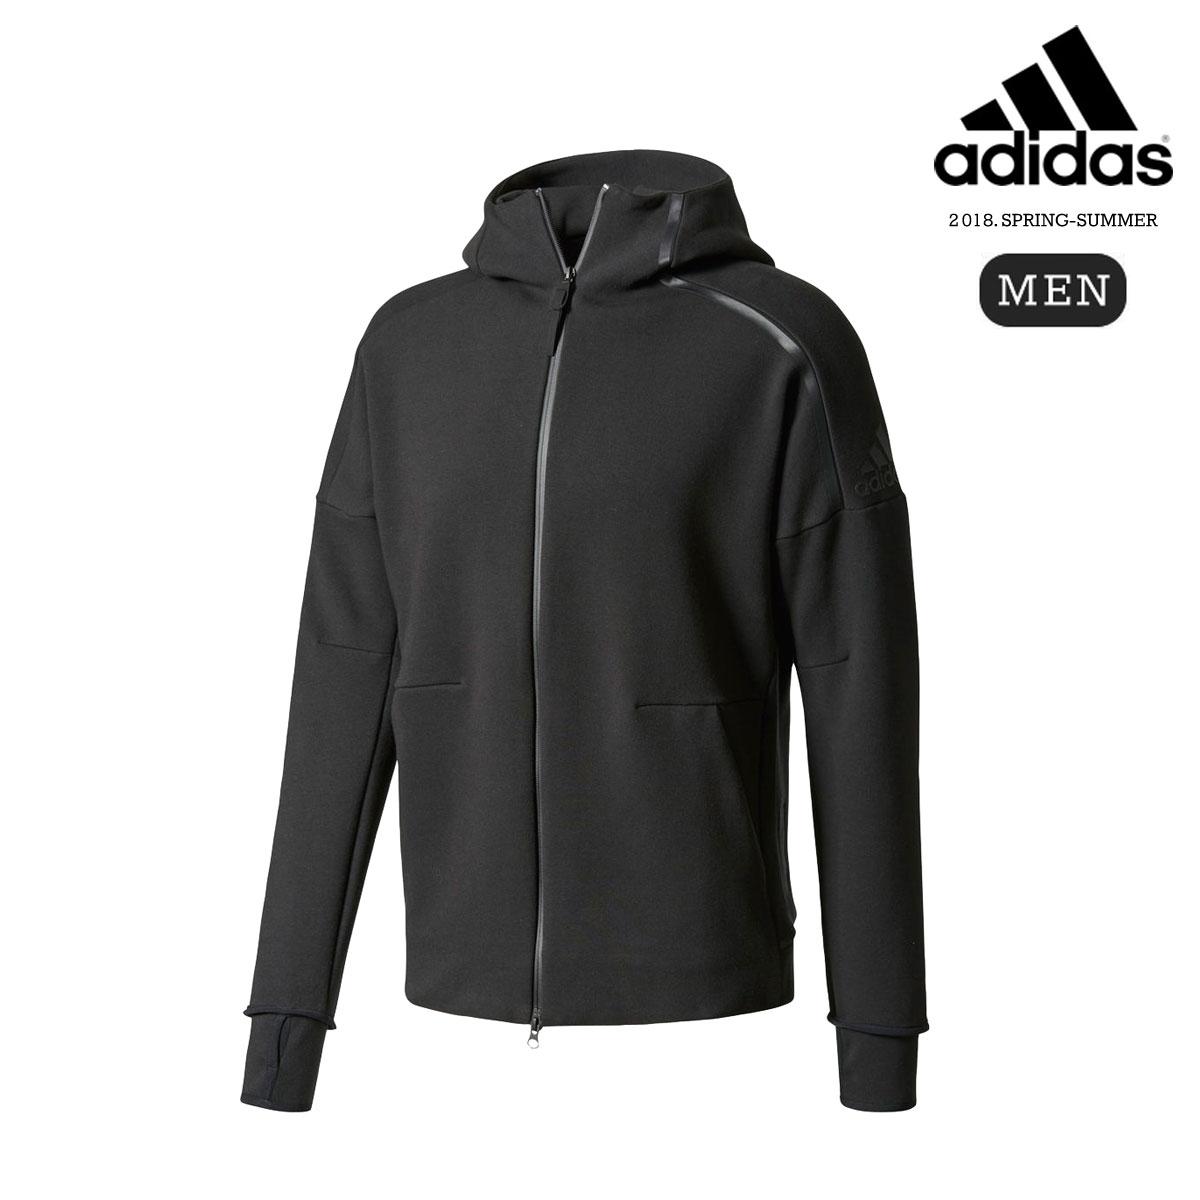 adidas M adidas Z.N.E. HOODIE 2.0 (Black) 【メンズサイズ】【18SS-I】【20】【sale0123】